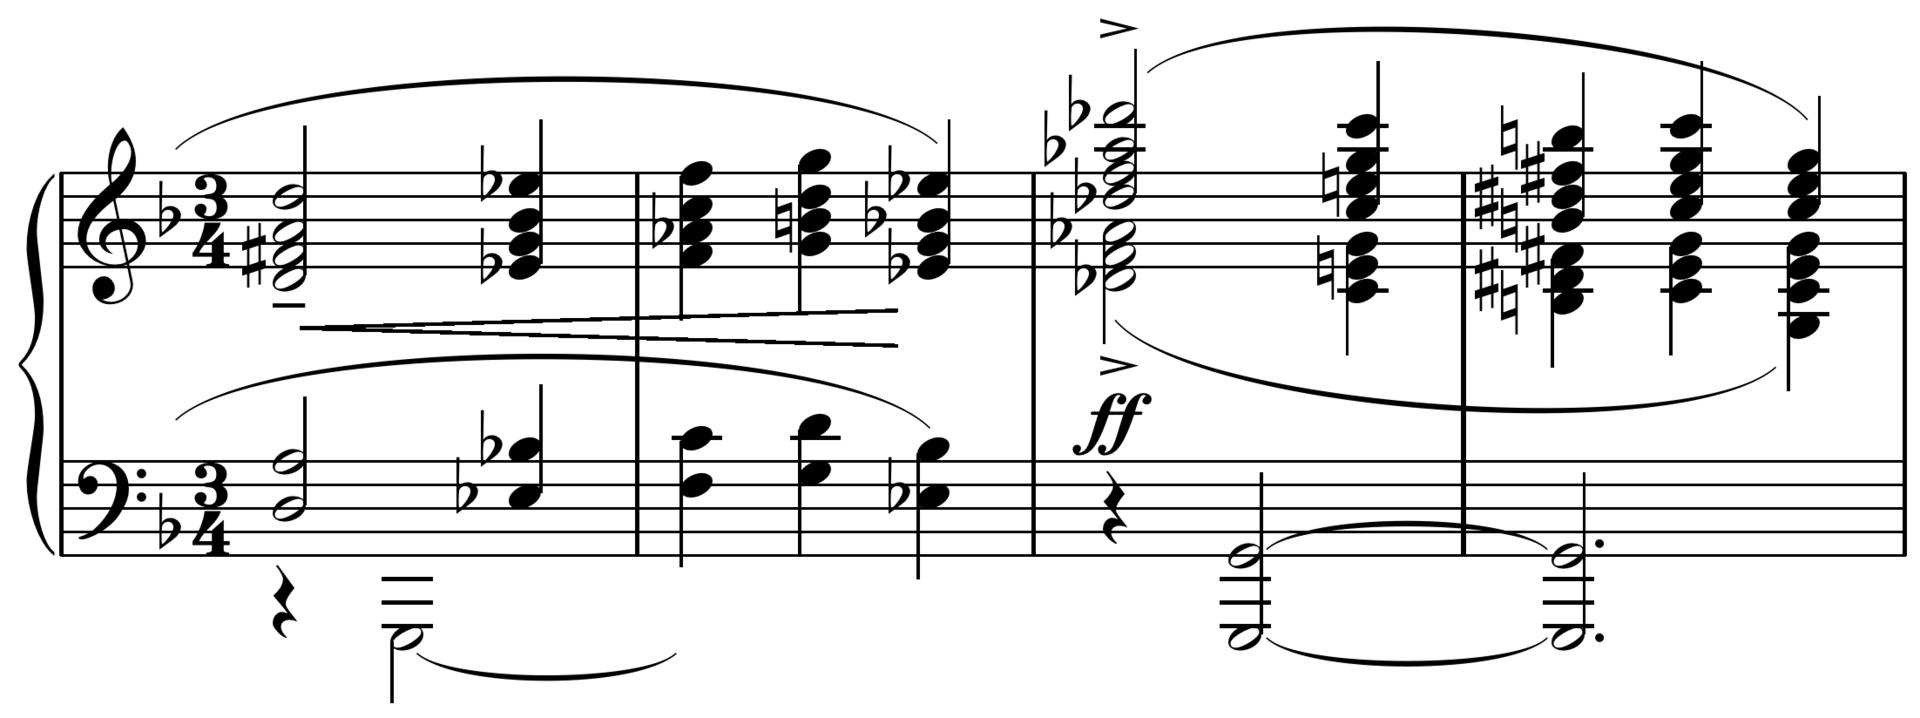 HarmonicPlaning-Triads